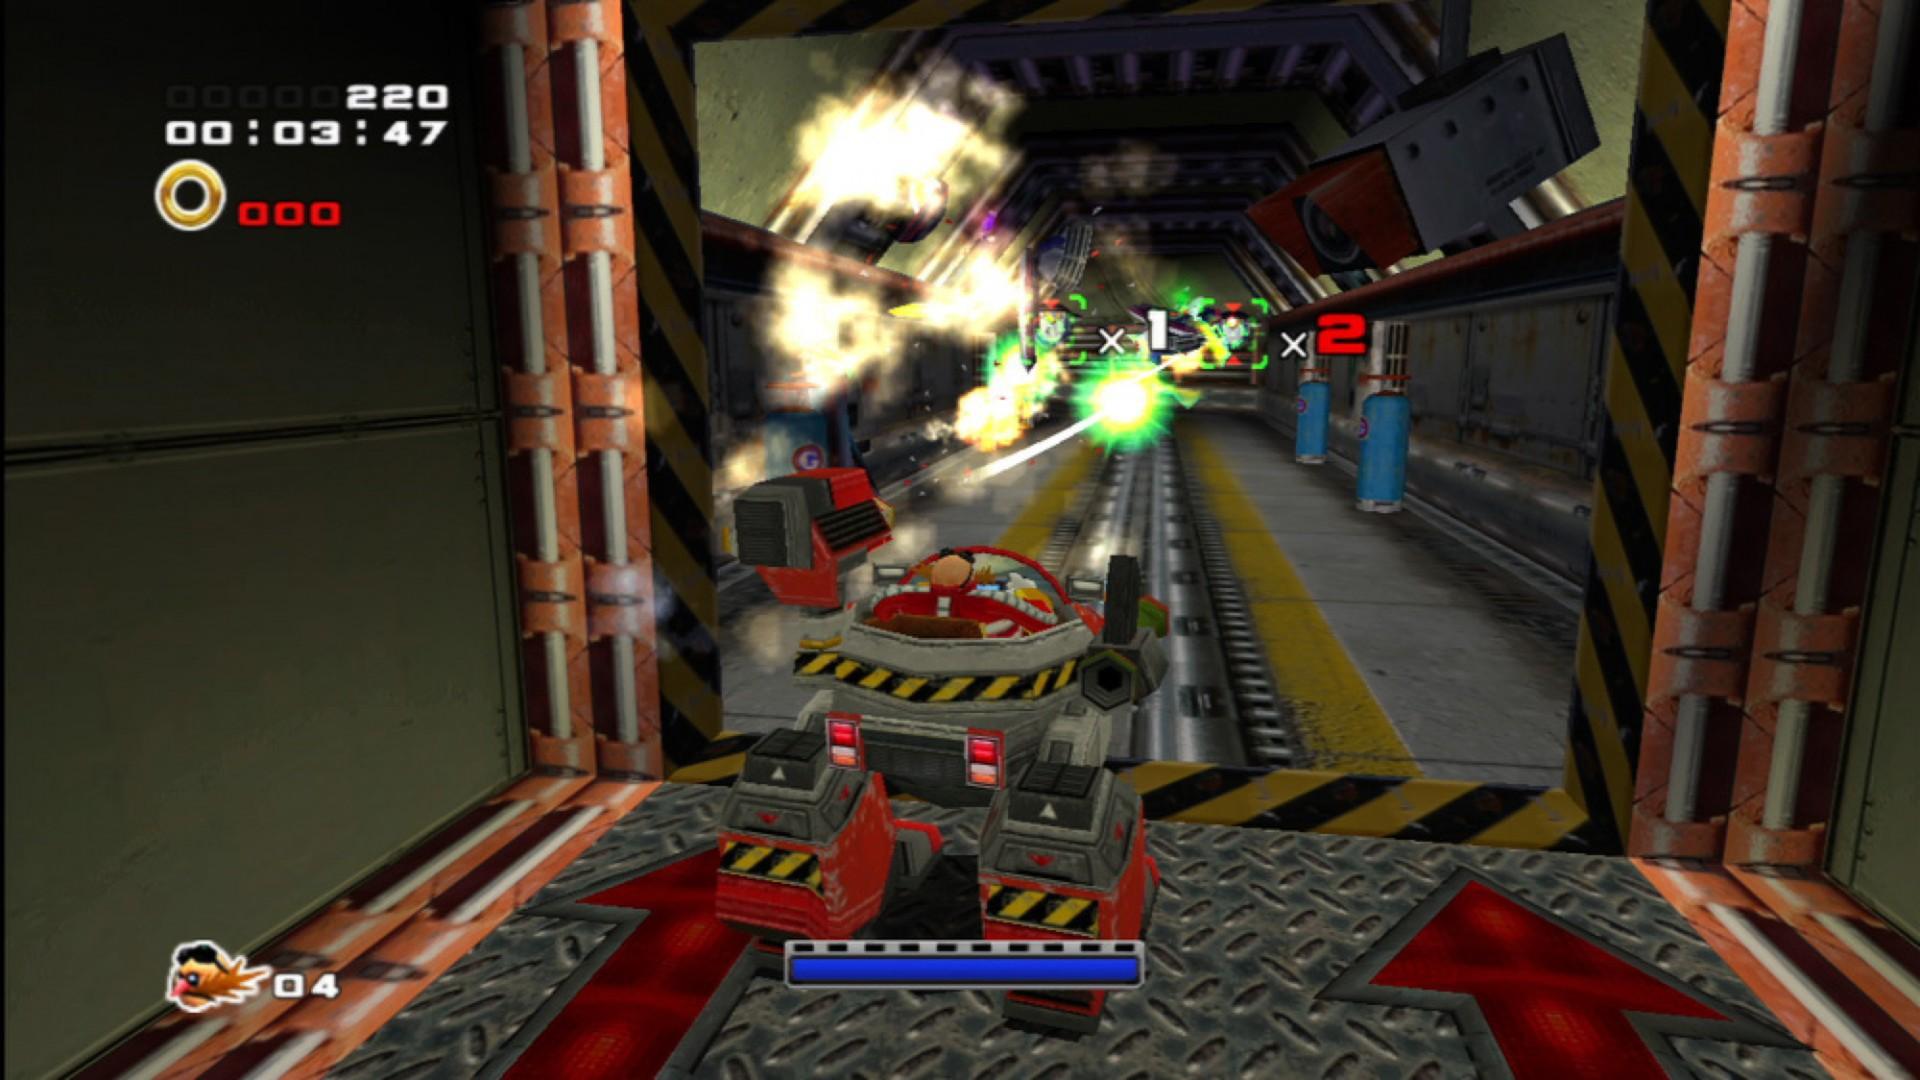 sonic adventure 2 battle pc torrent